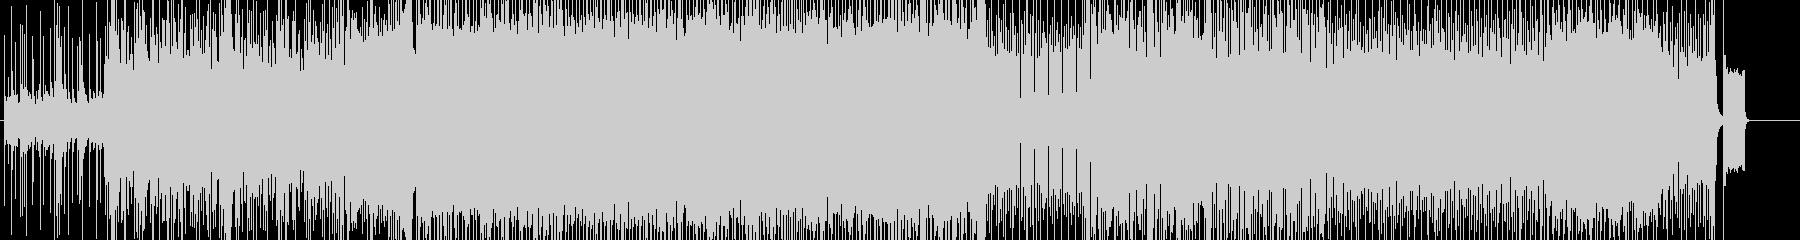 「HR/HM」「ROCK」BGM107の未再生の波形